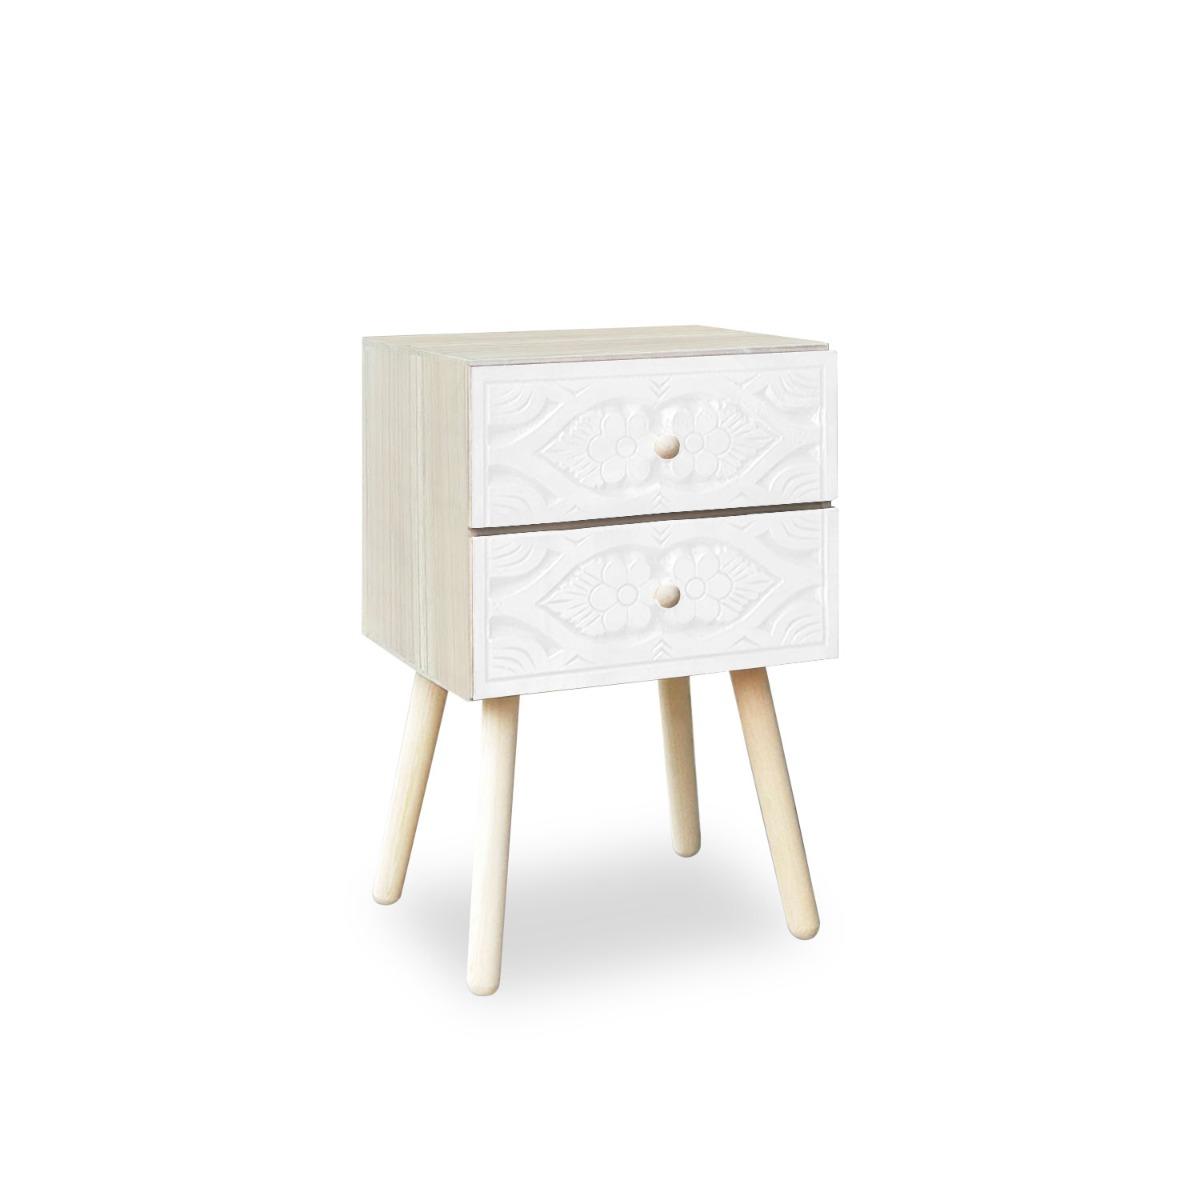 Table de chevet Catana 2 tiroirs Blanc